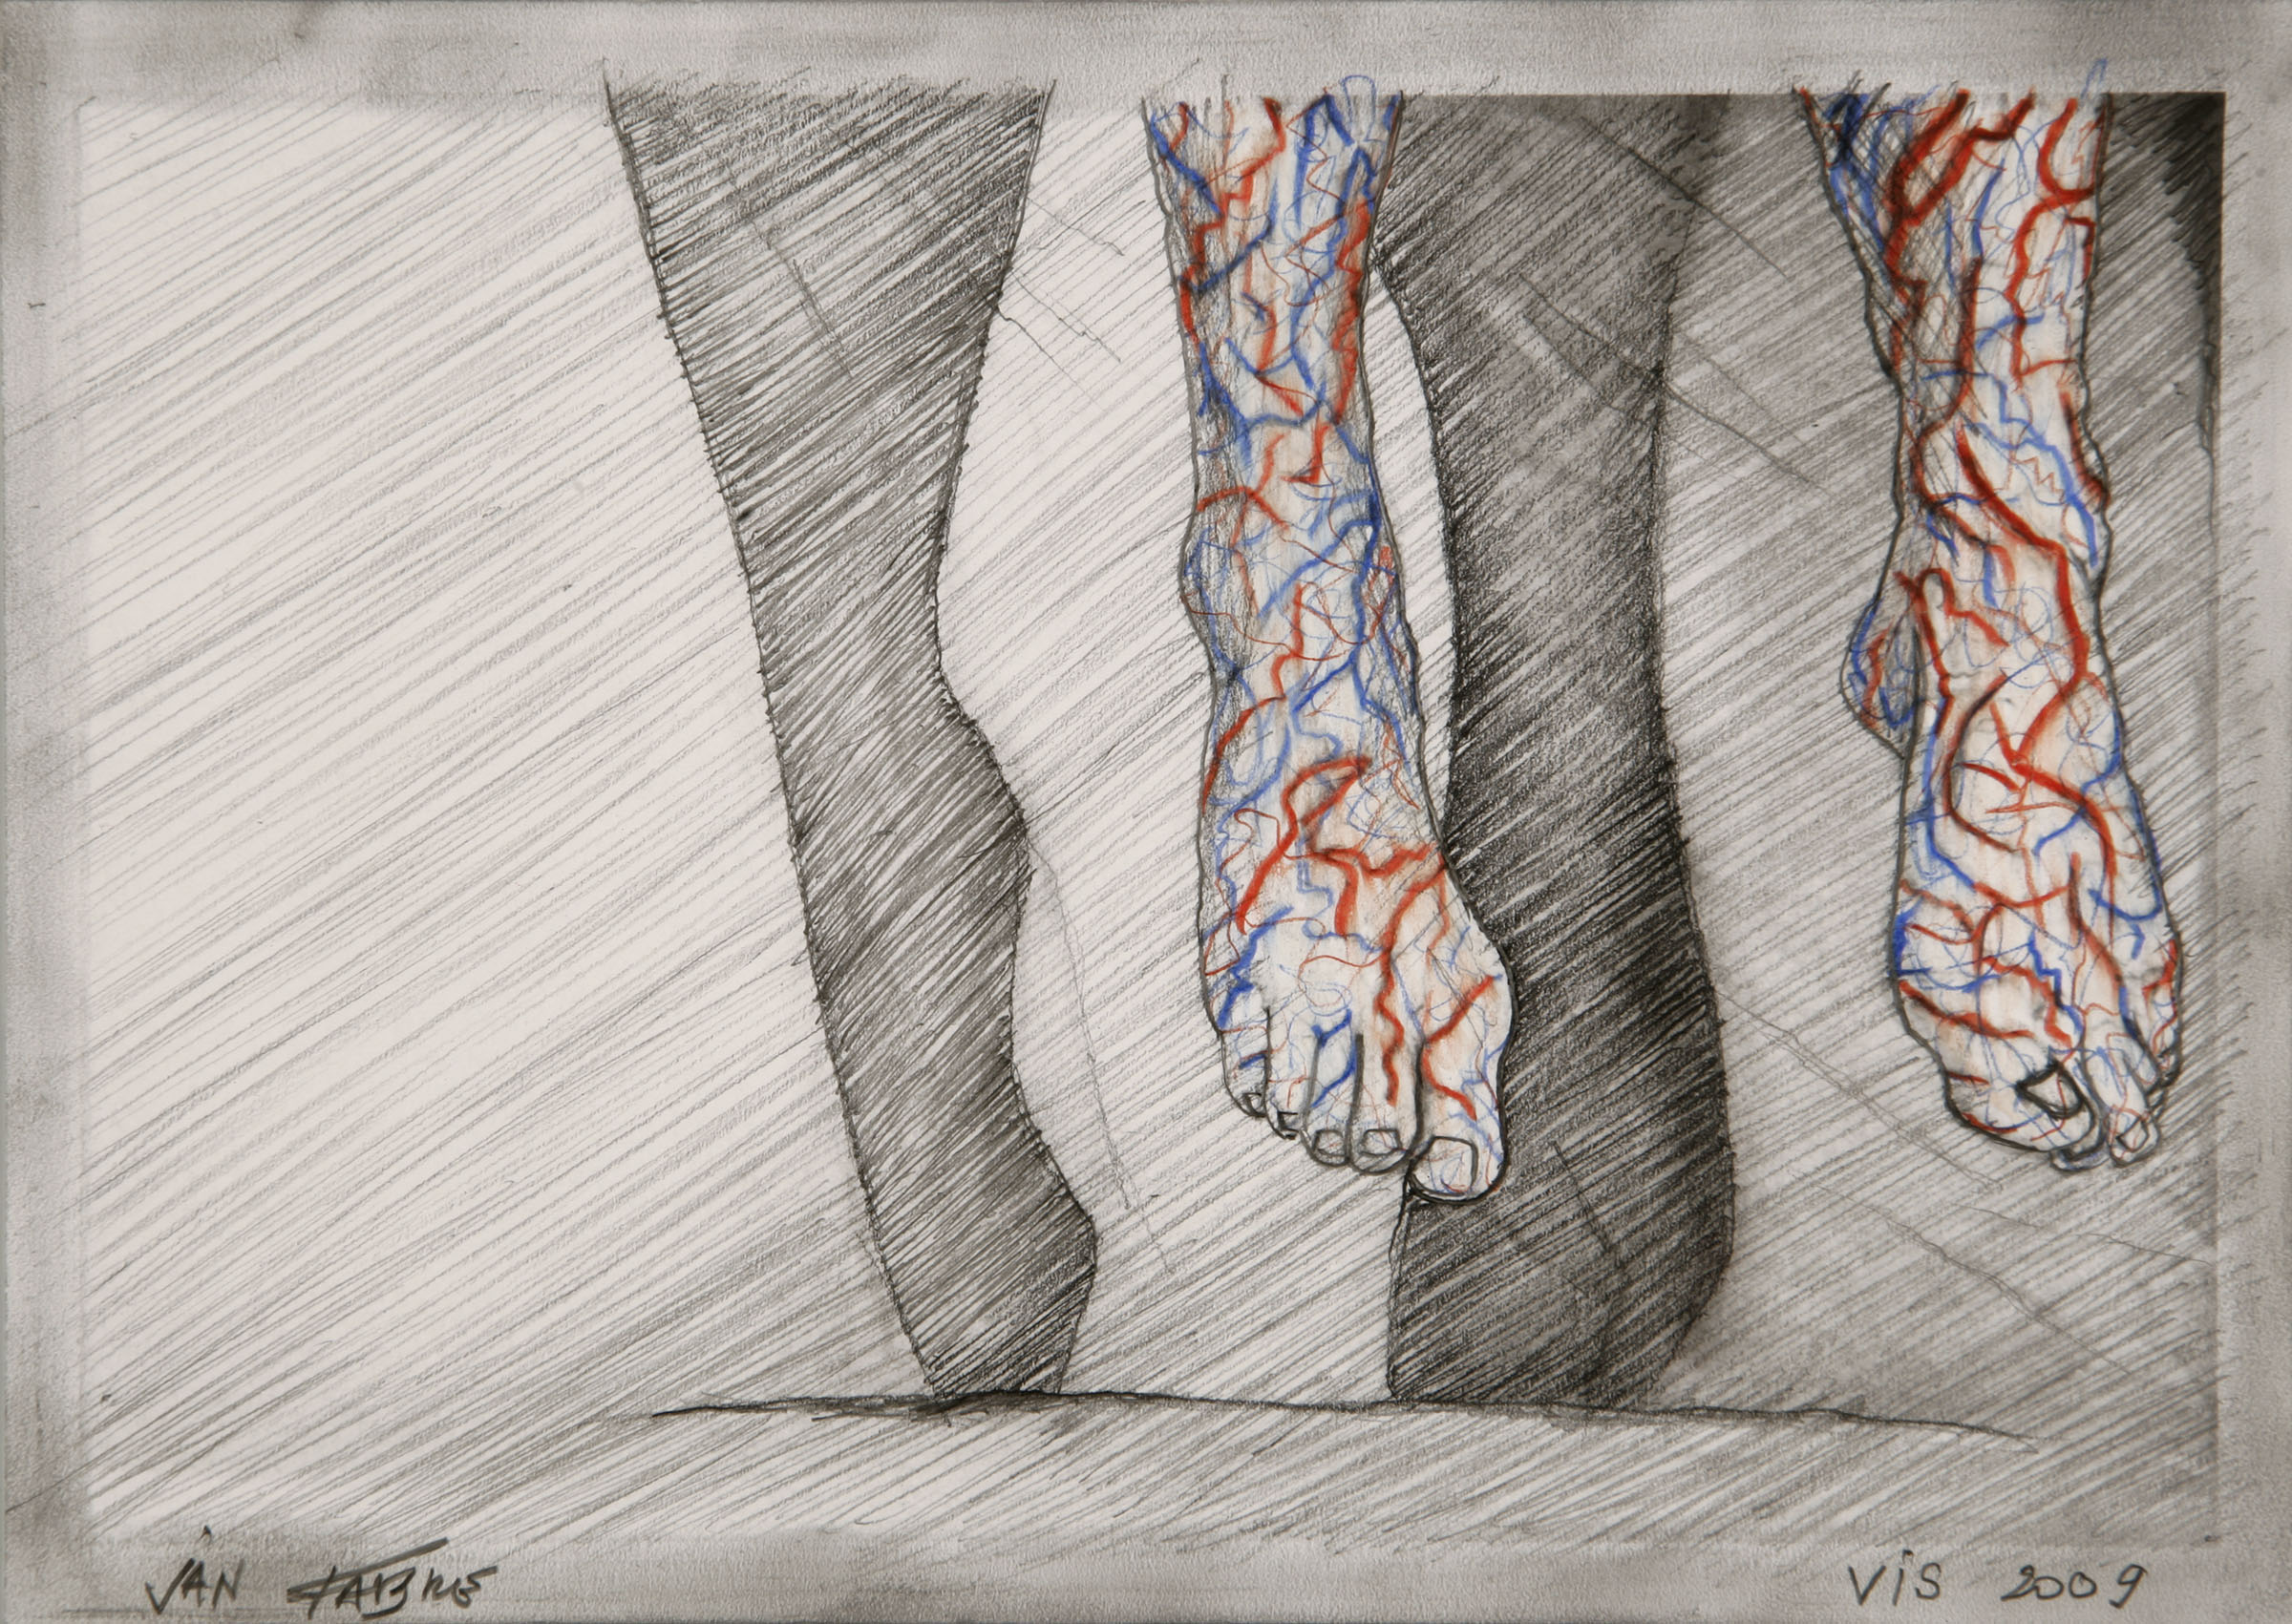 Jumping brain legs ,2009,HB pencil, colour pencil on photo paper,12,5x17,5 cm  Ph. Pat Verbruggen ©Angelos bvba